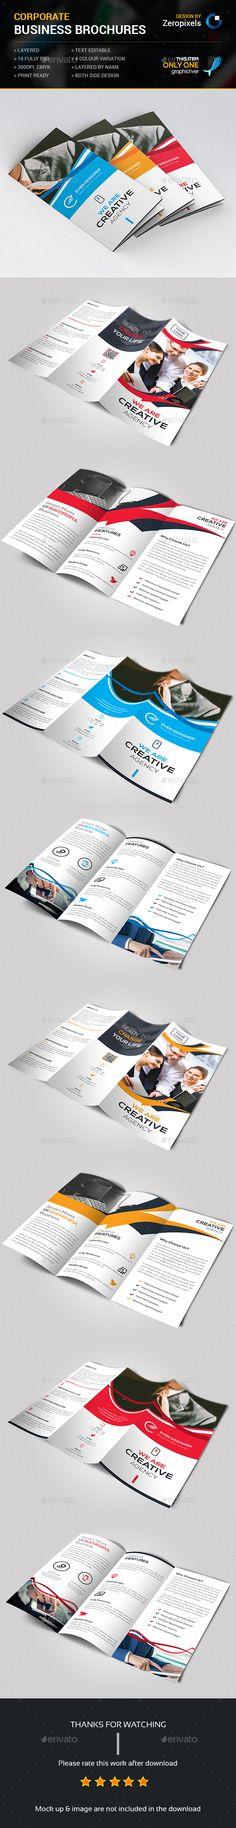 Trifold Brochure Bundle Templates PSD. Download here: http://graphicriver.net/item/trifold-bundle/16149309?ref=ksioks